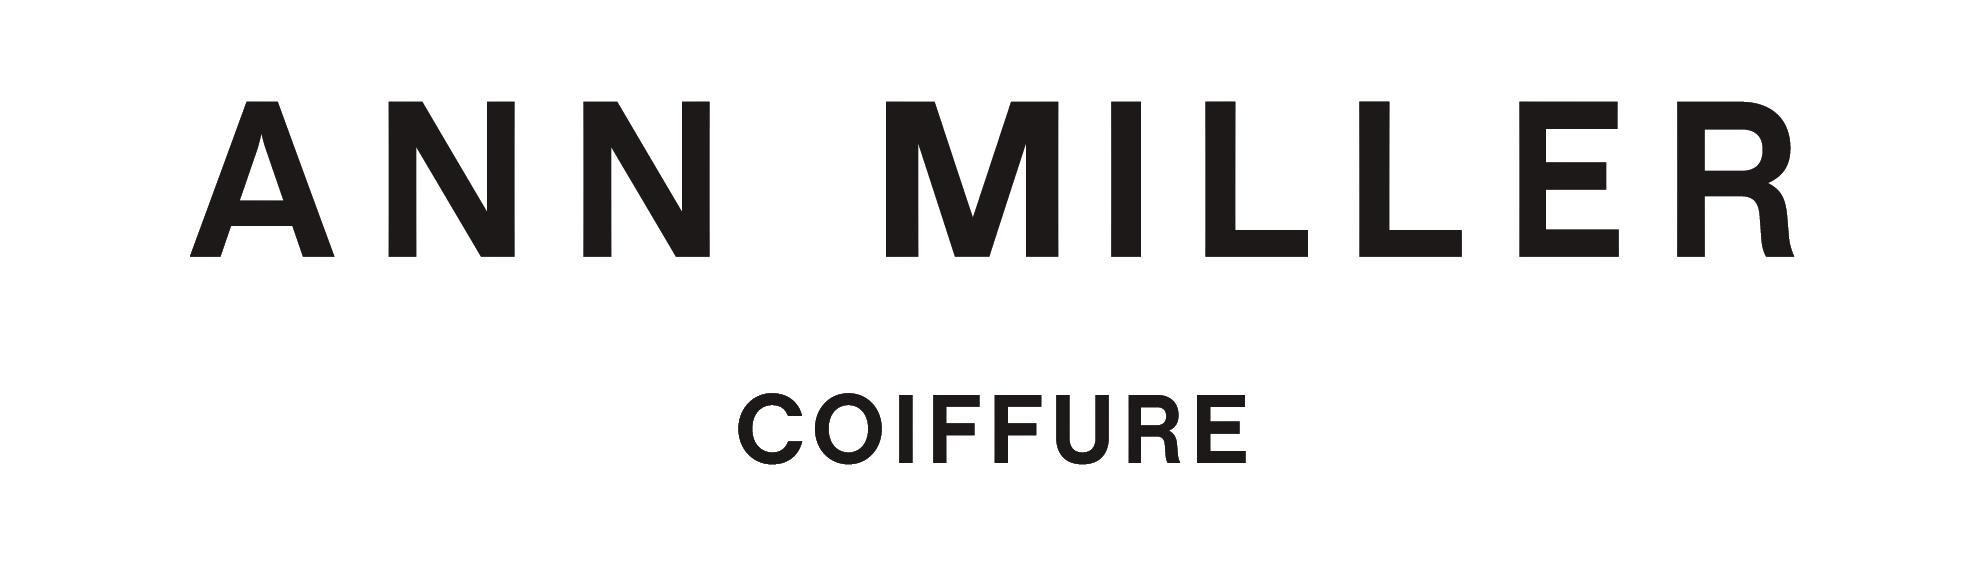 ANN MILLER coiffure / Logo